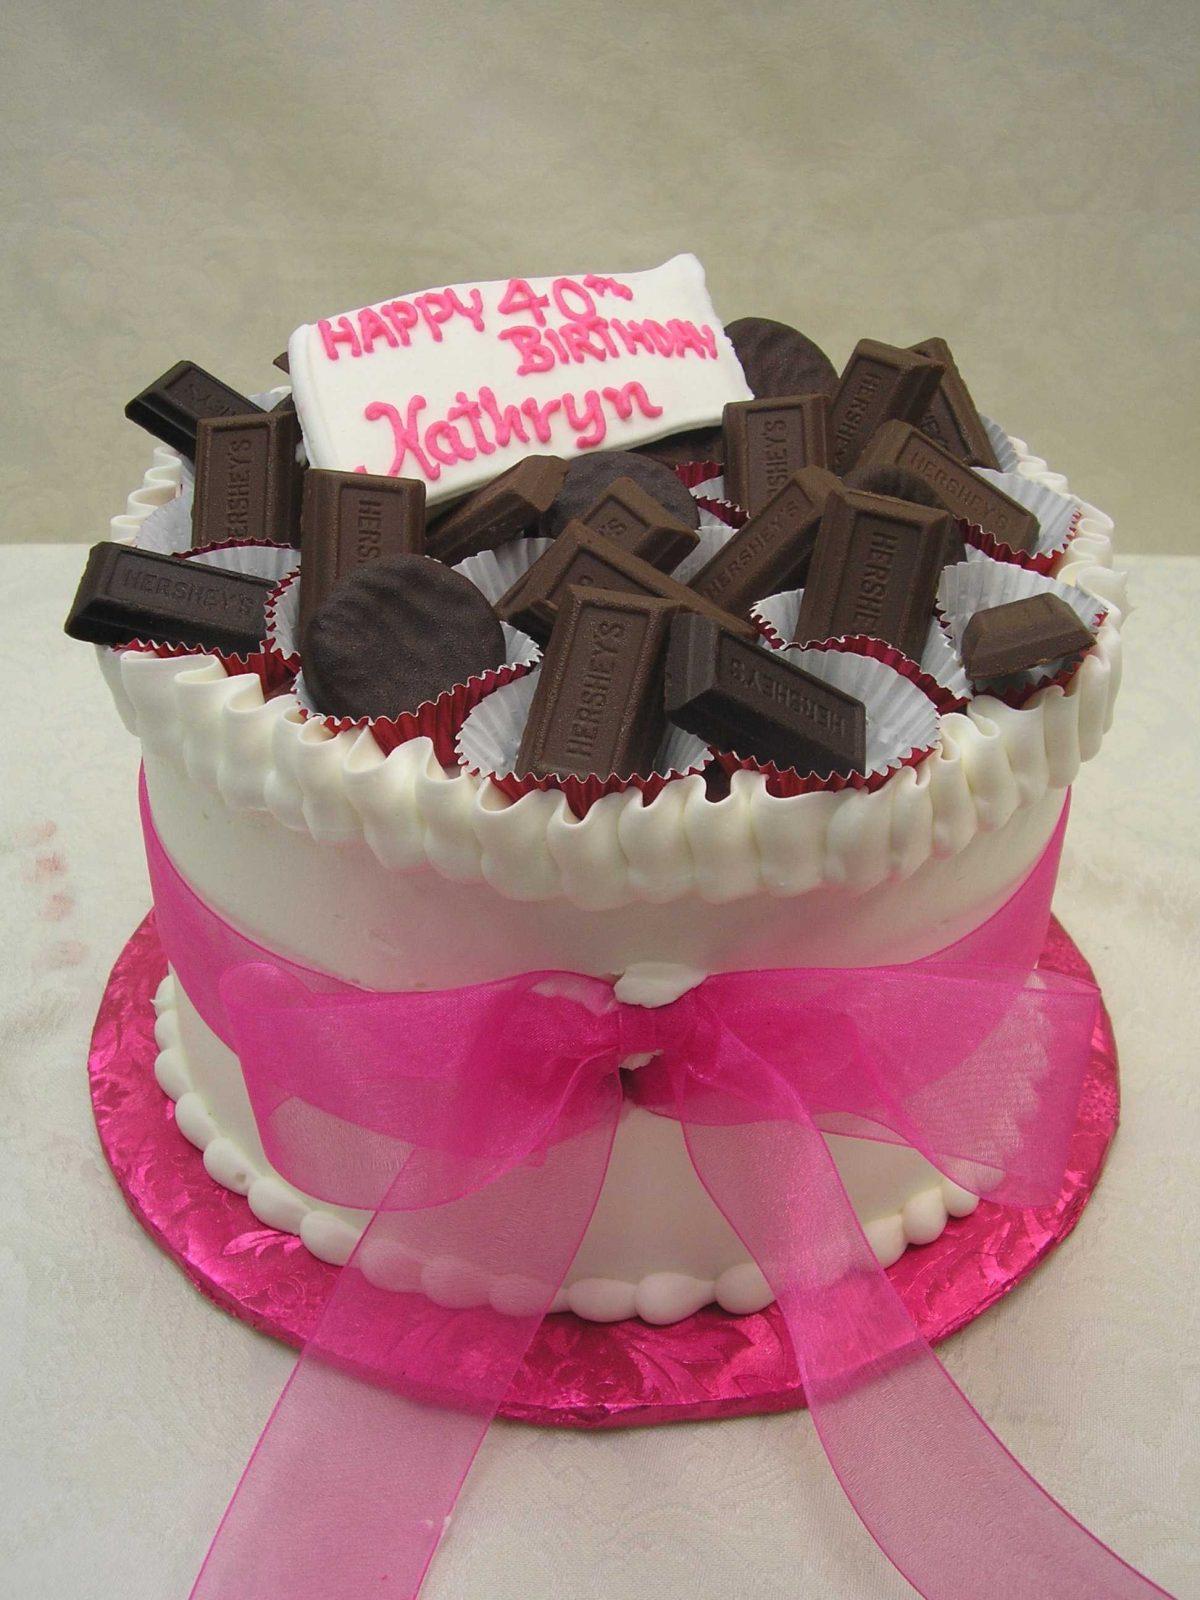 chocolates on top of cake designed like a box of chocolates